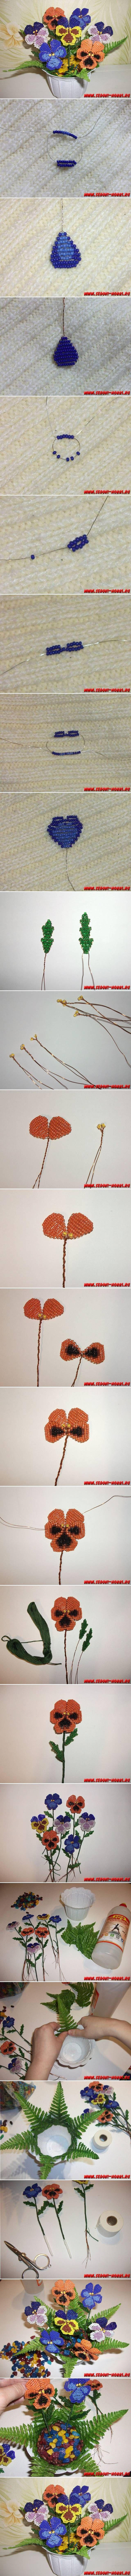 DIY Beads Pansy Flower DIY Beads Pansy Flower